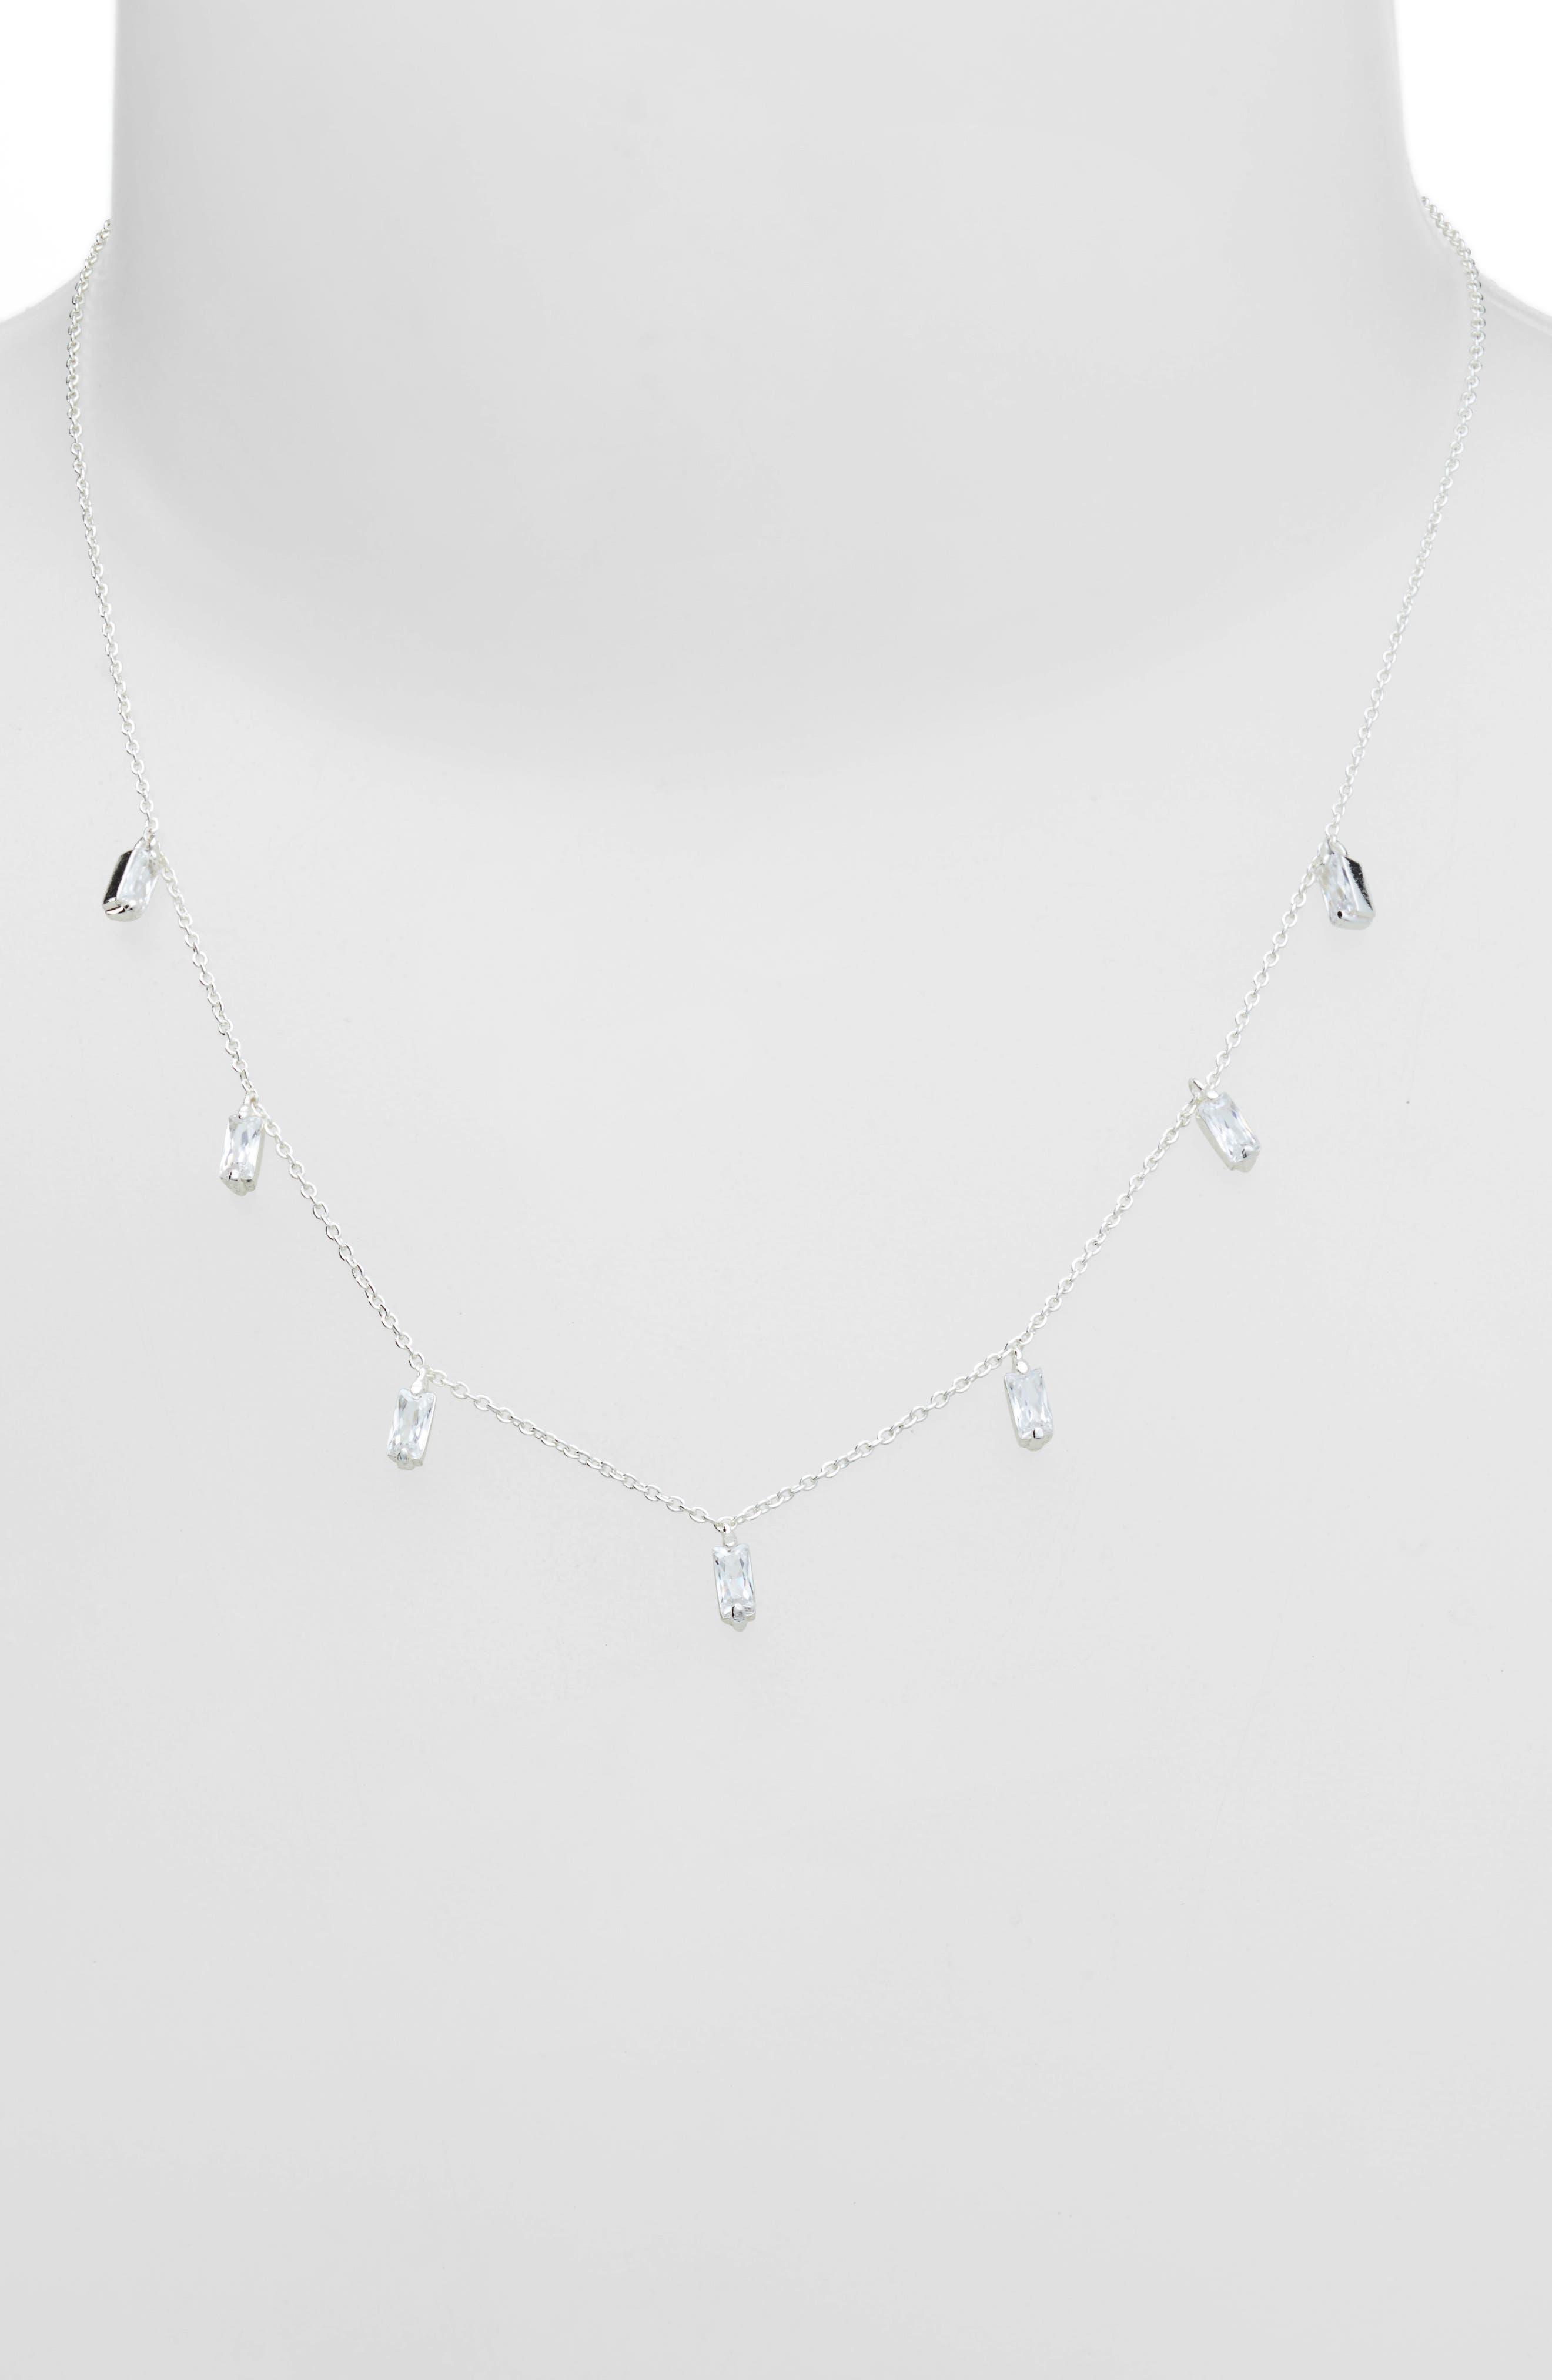 Amara Crystal Fringe Necklace,                             Alternate thumbnail 2, color,                             SILVER